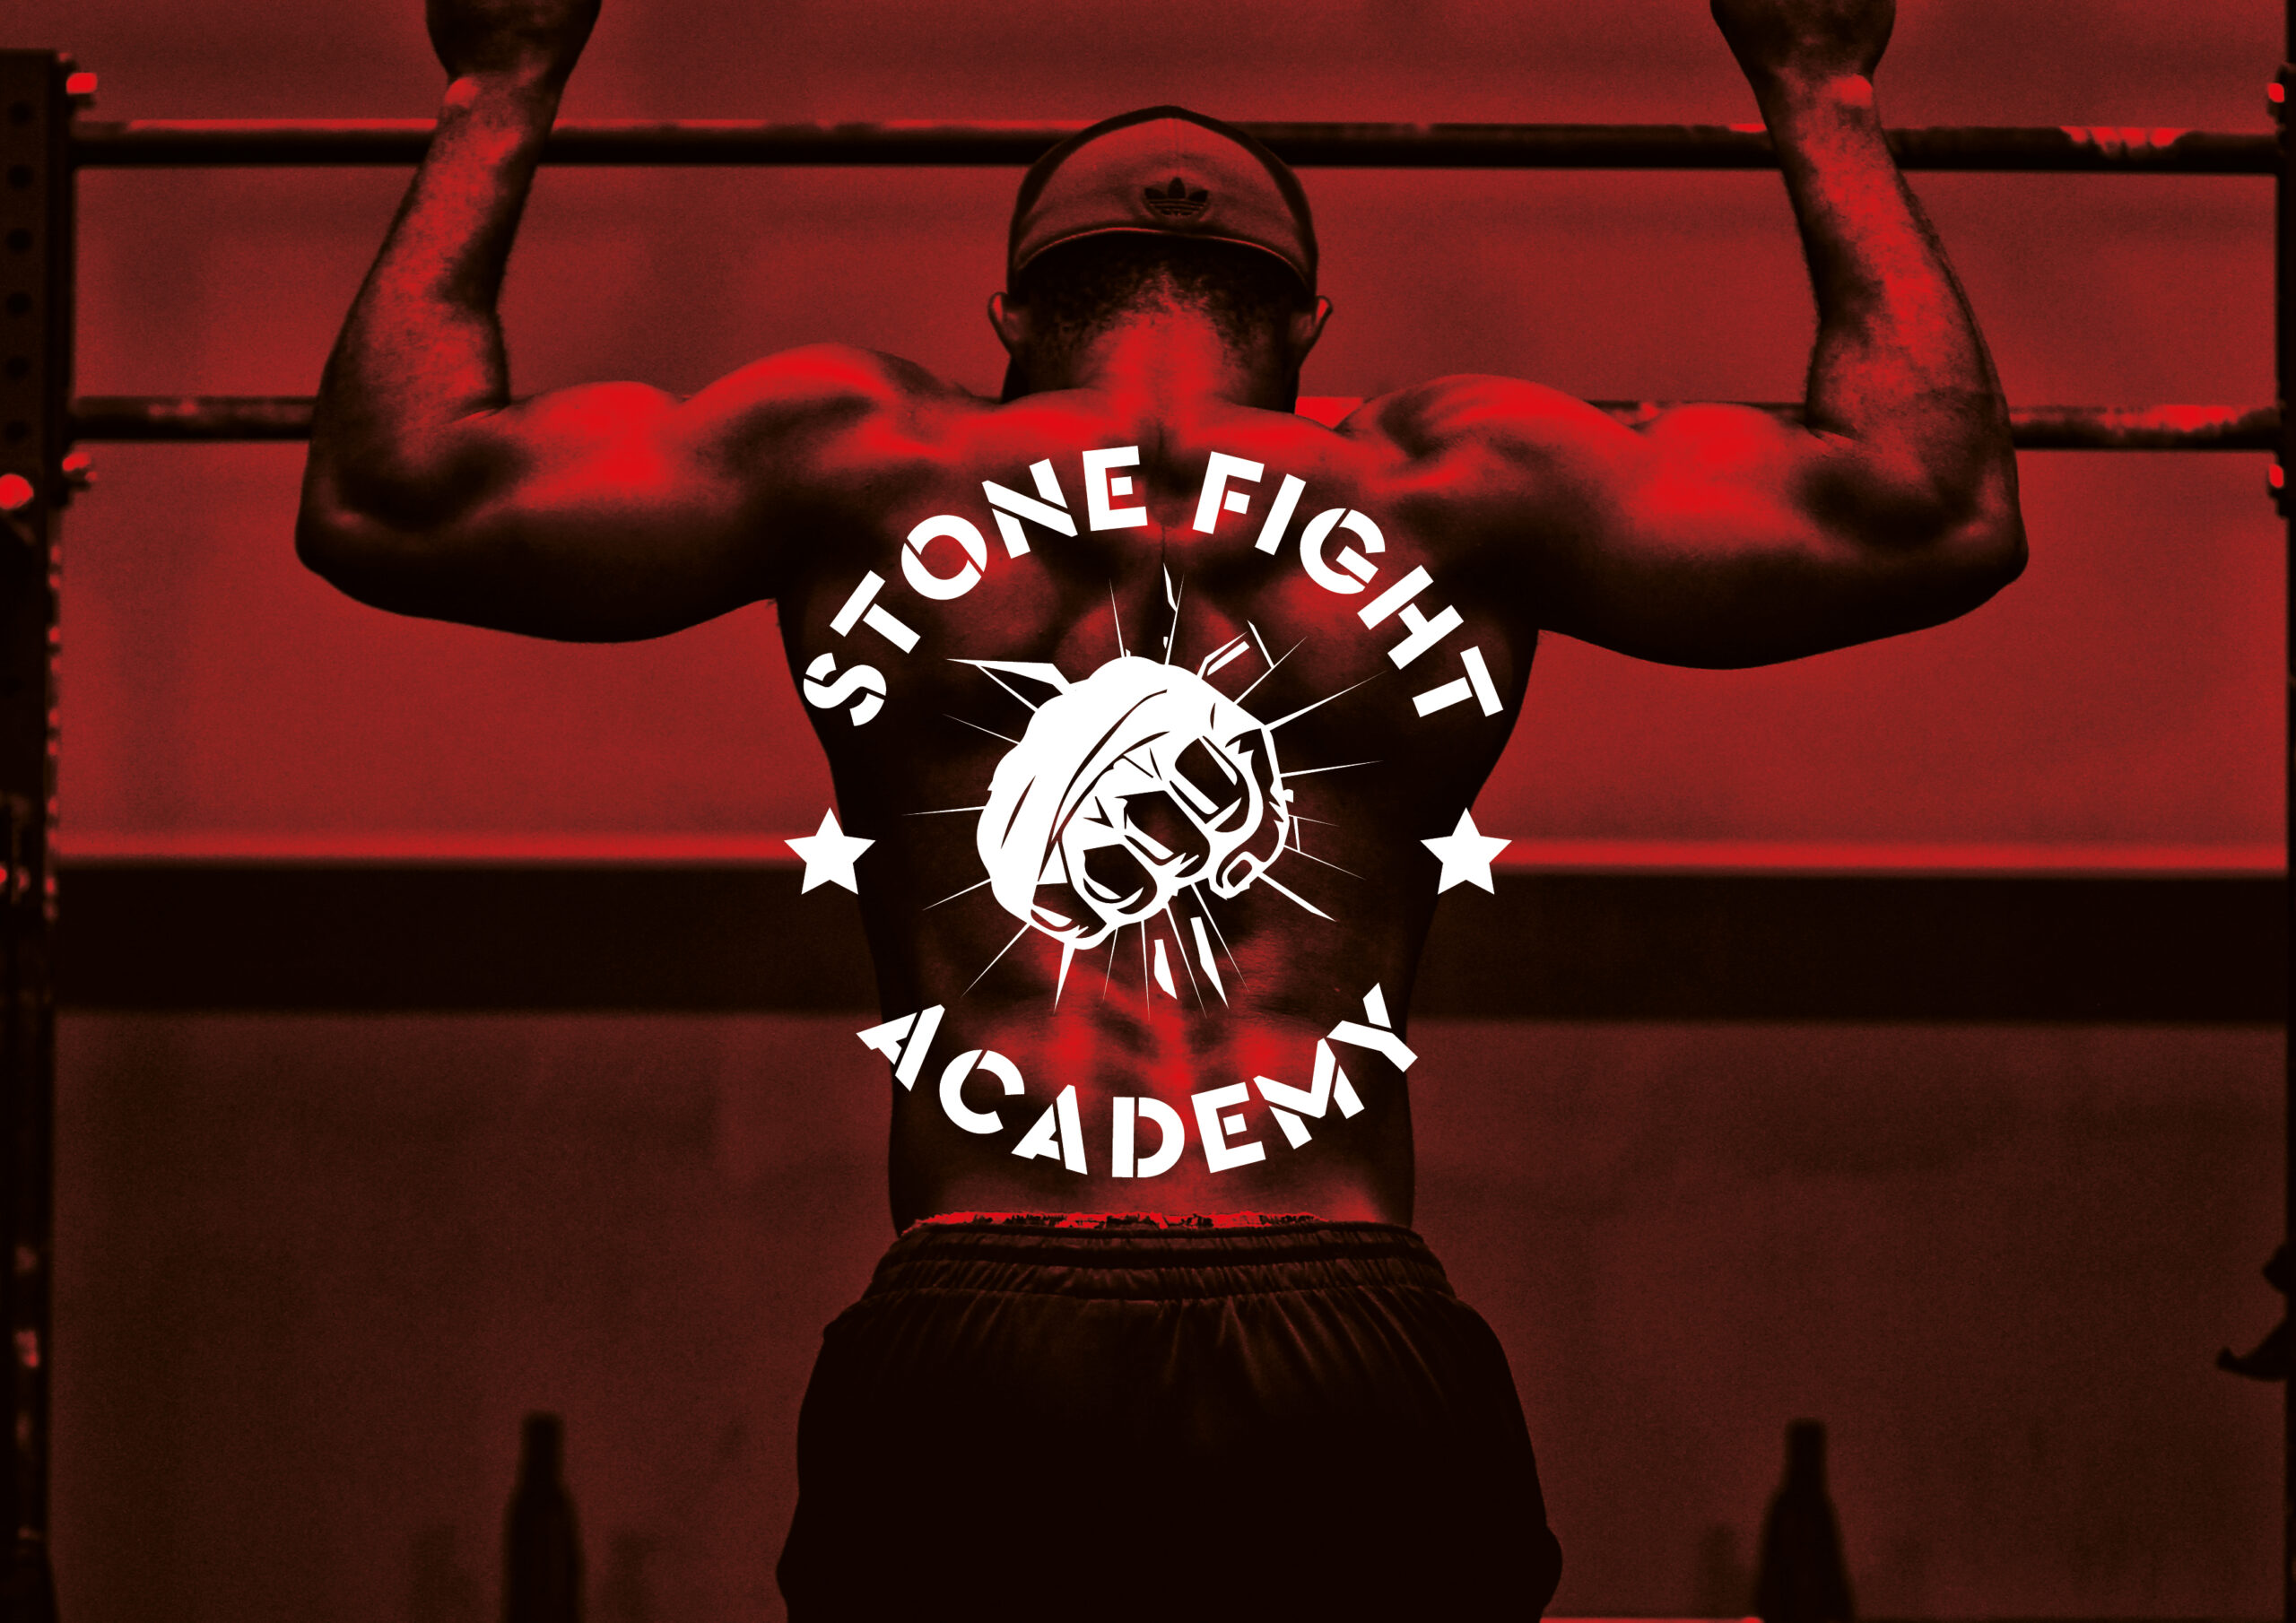 Stone fight academy thumbnail